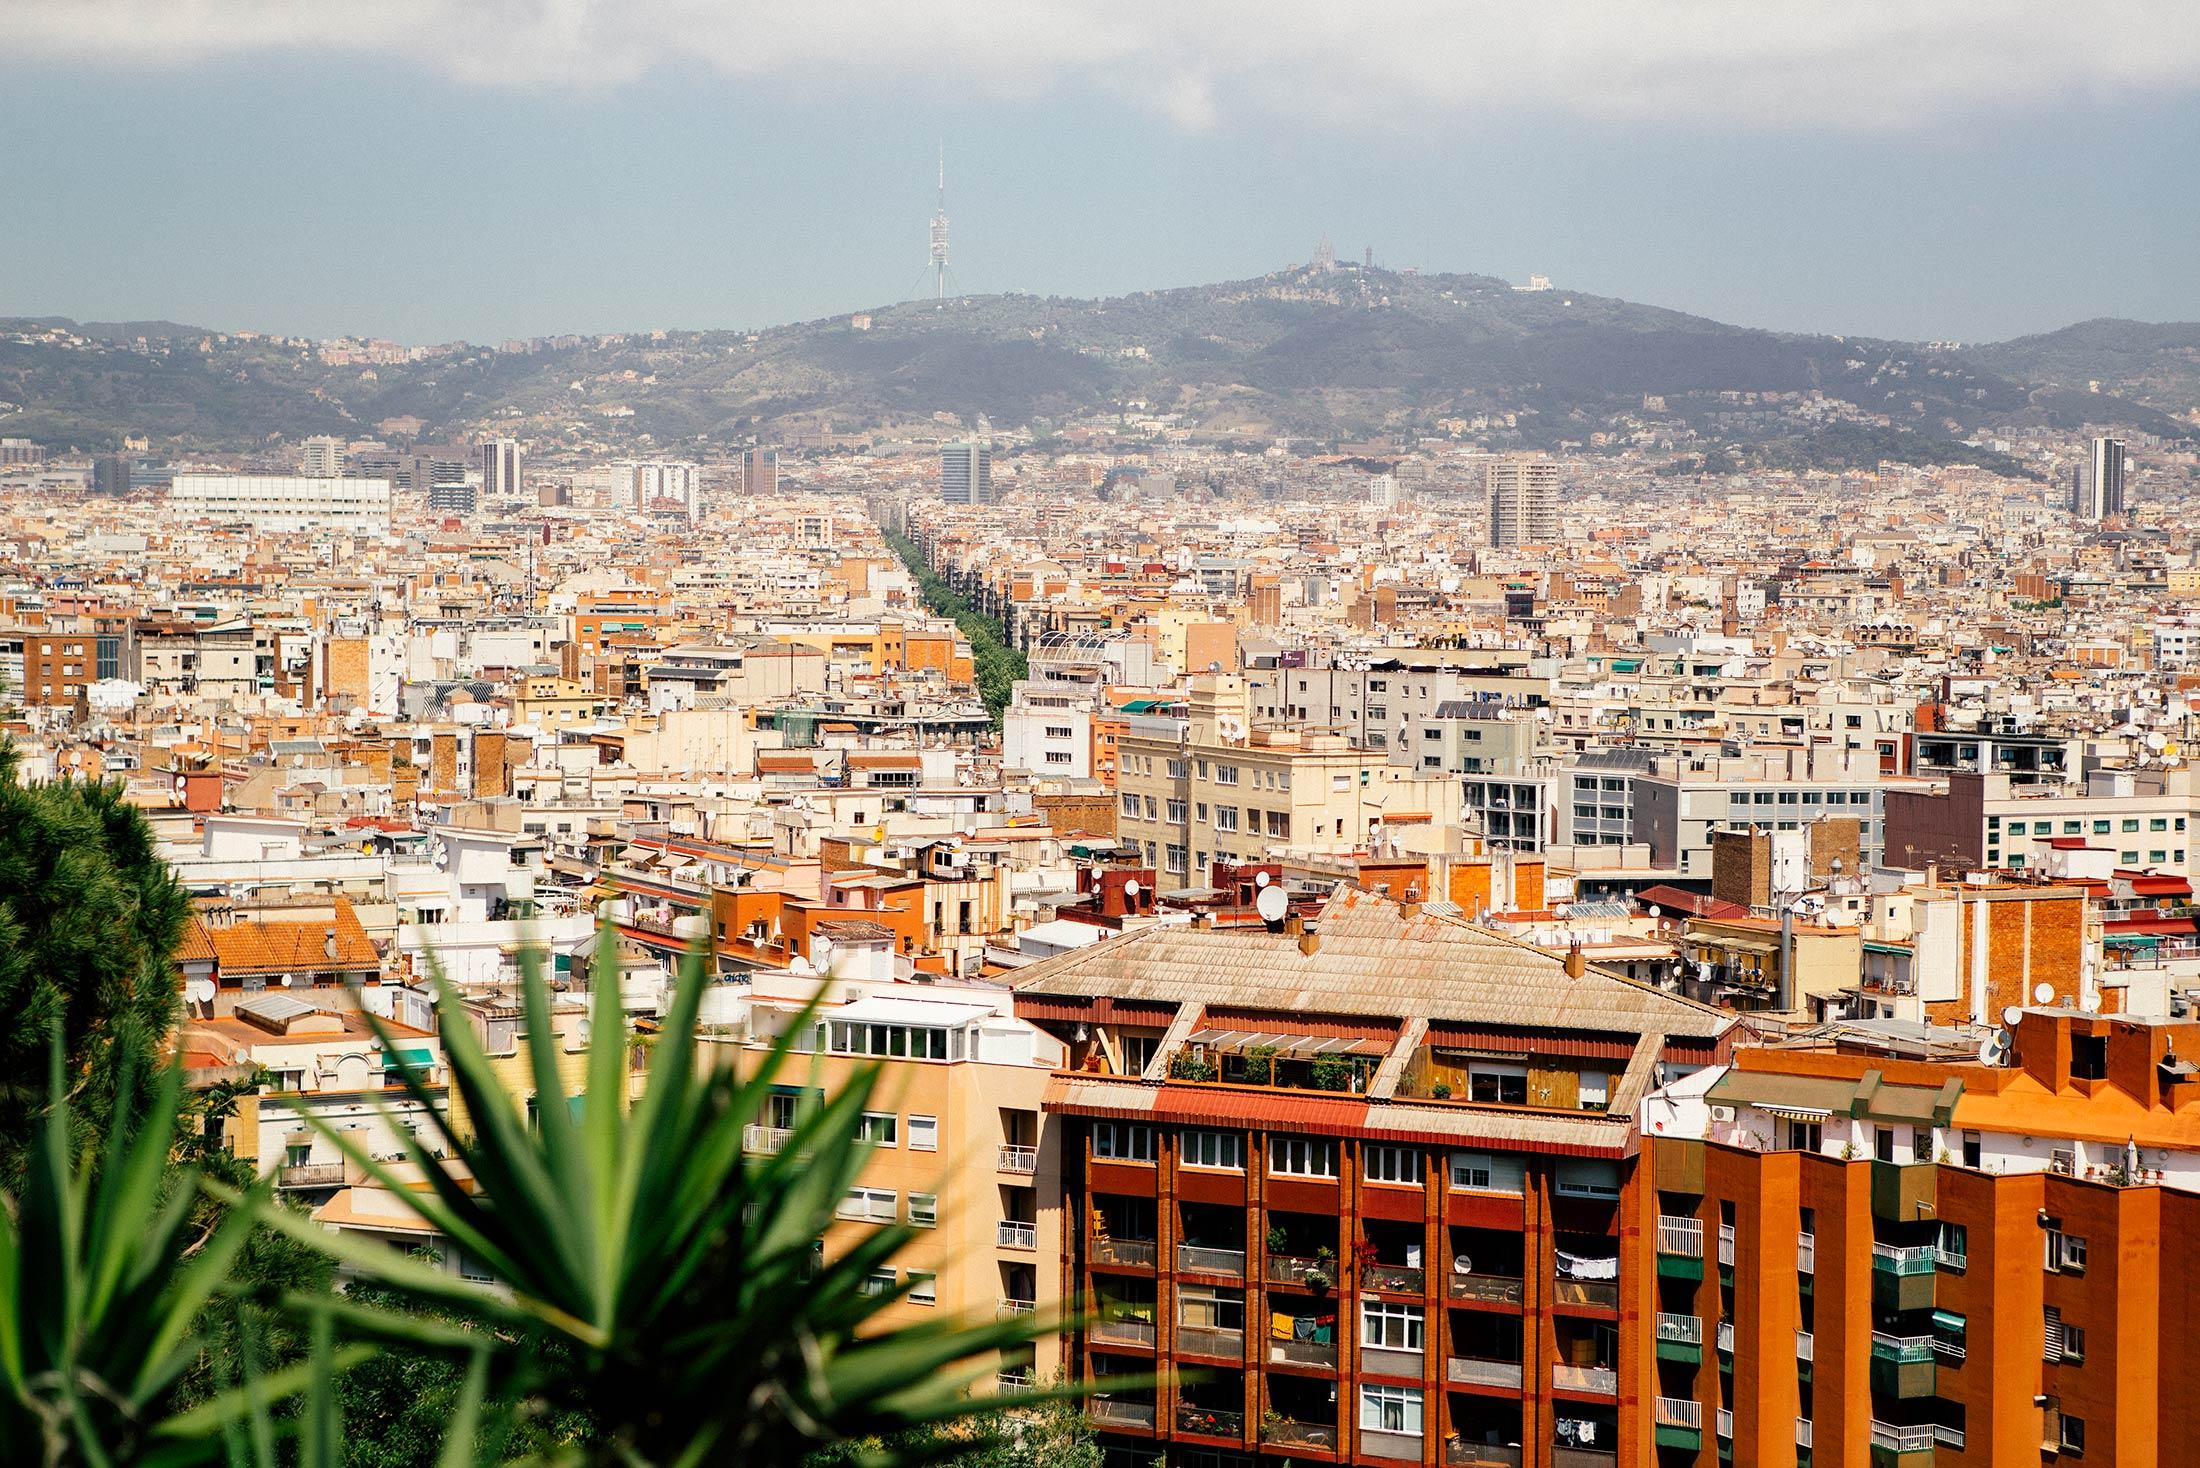 BCN_Barcelona_14-Mitja_Schneehage